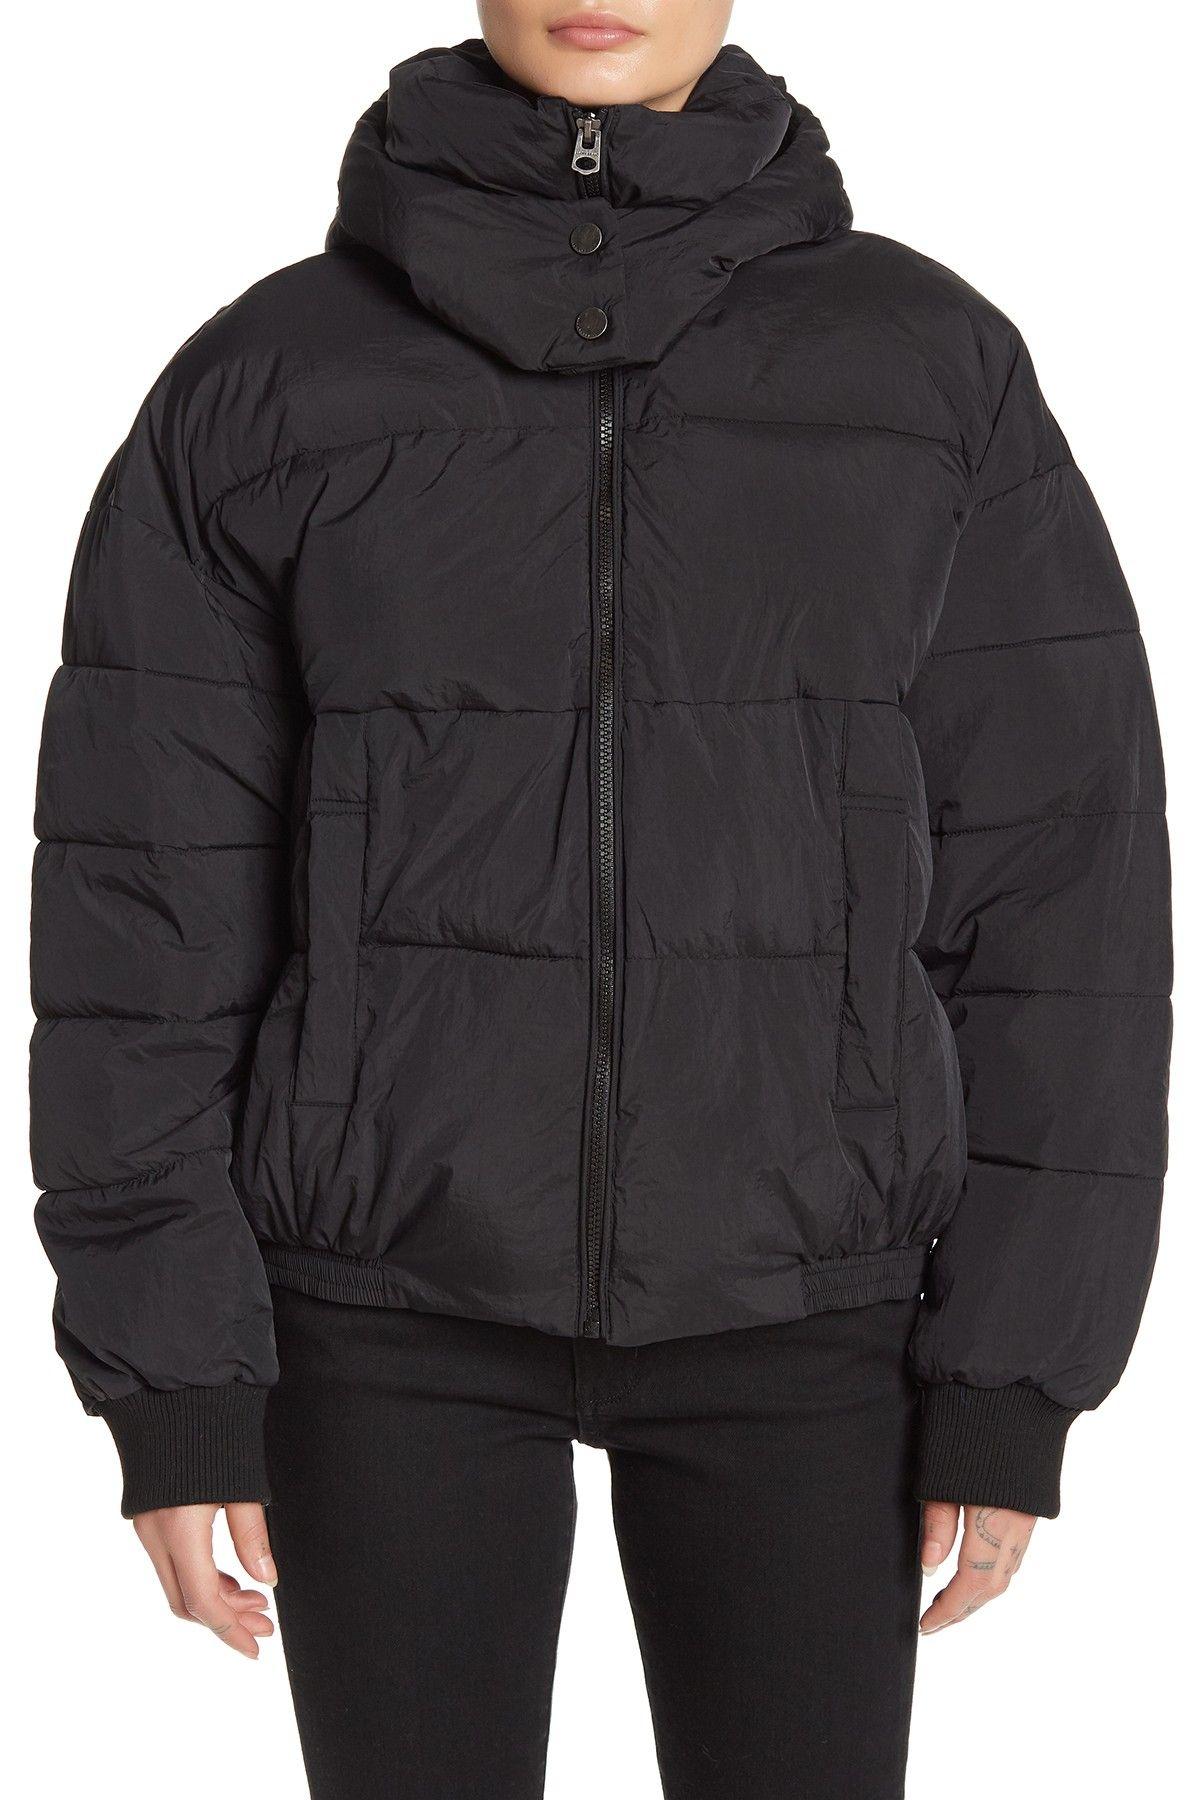 Lucky Brand Missy Short Puffer Jacket Hautelook Short Puffer Jacket Puffer Jackets Jackets [ 1800 x 1200 Pixel ]